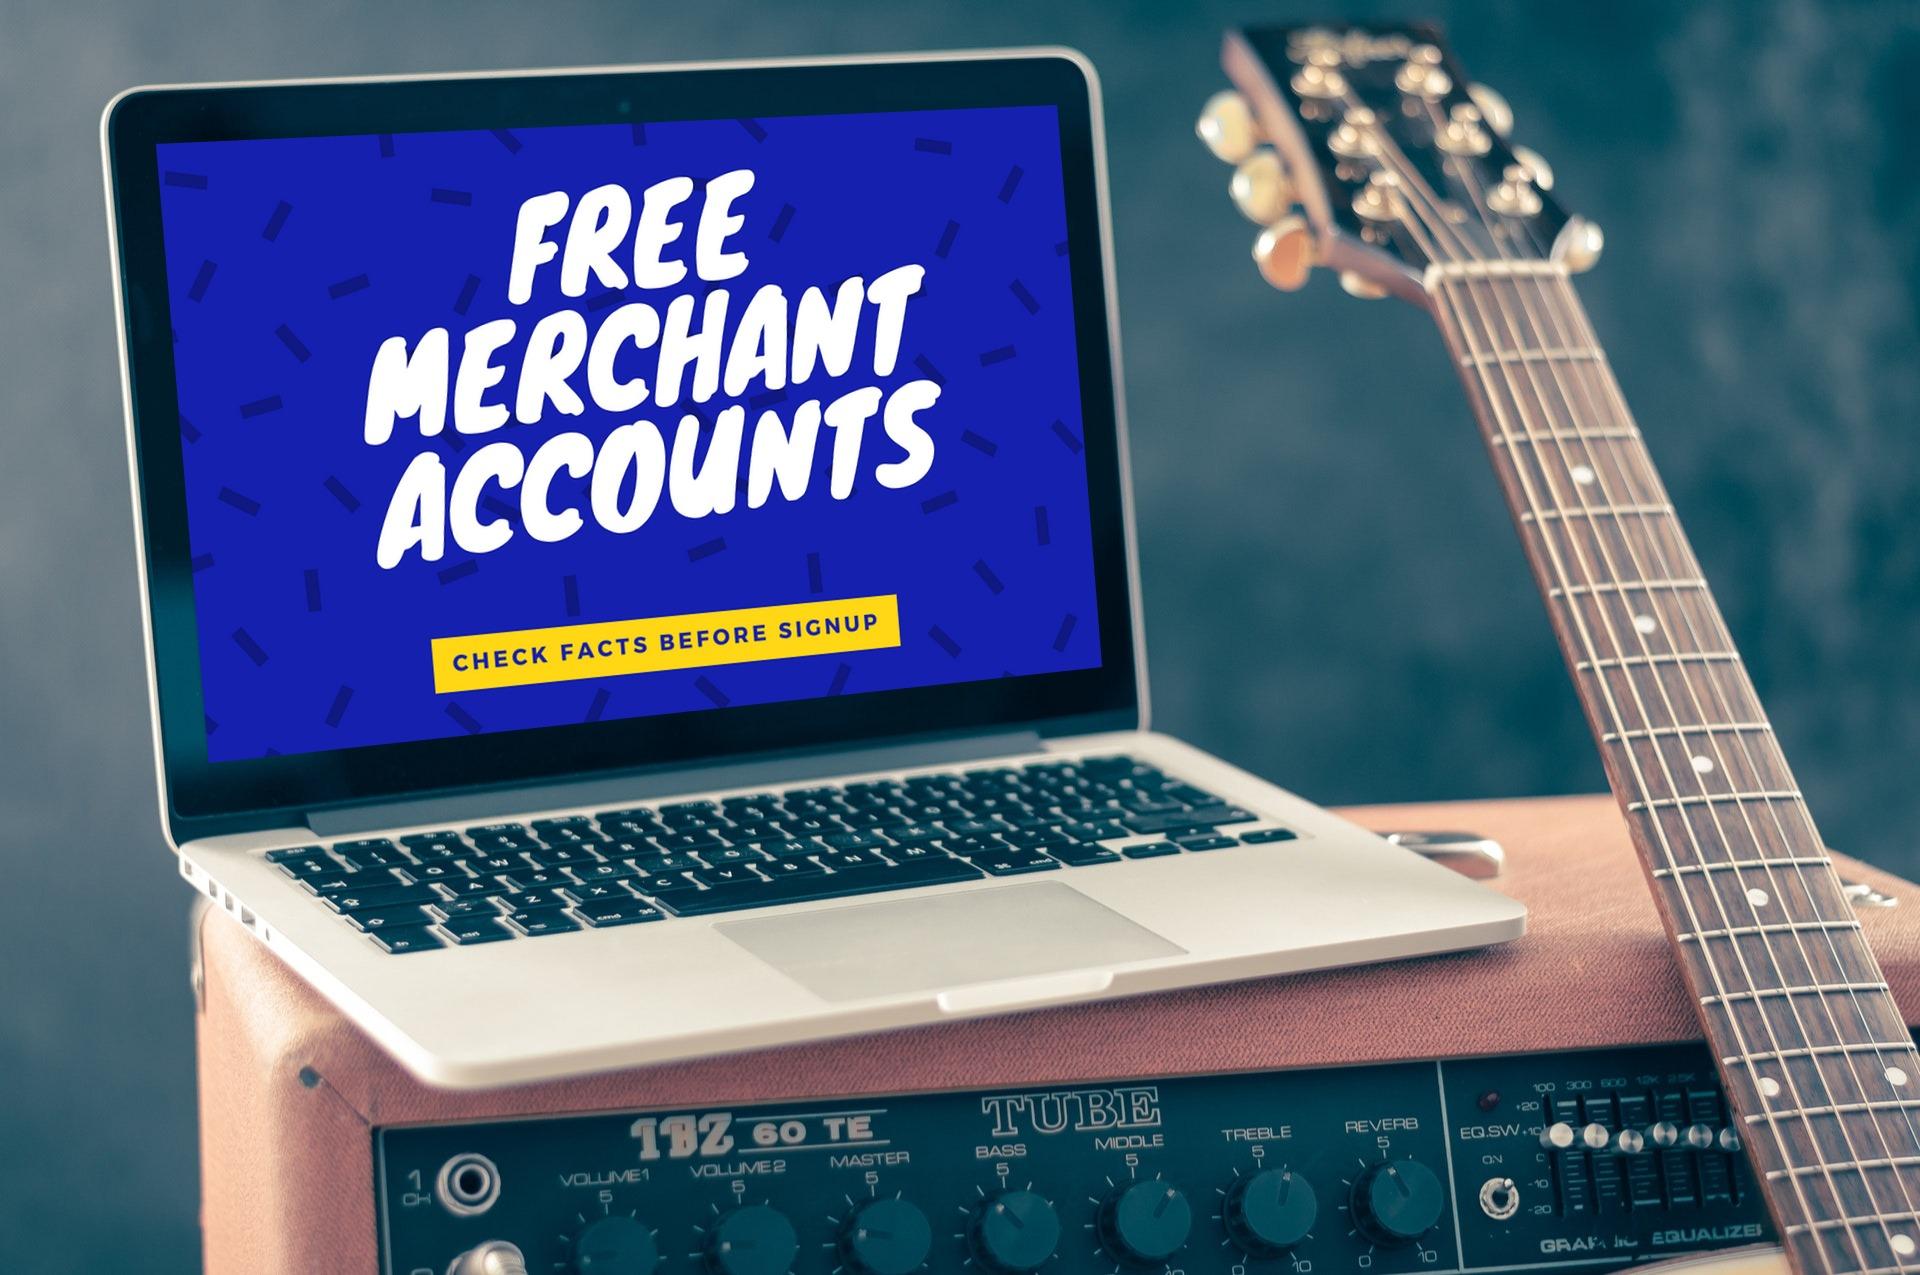 FREE MERCHANT ACCOUNTS By Quadrapay